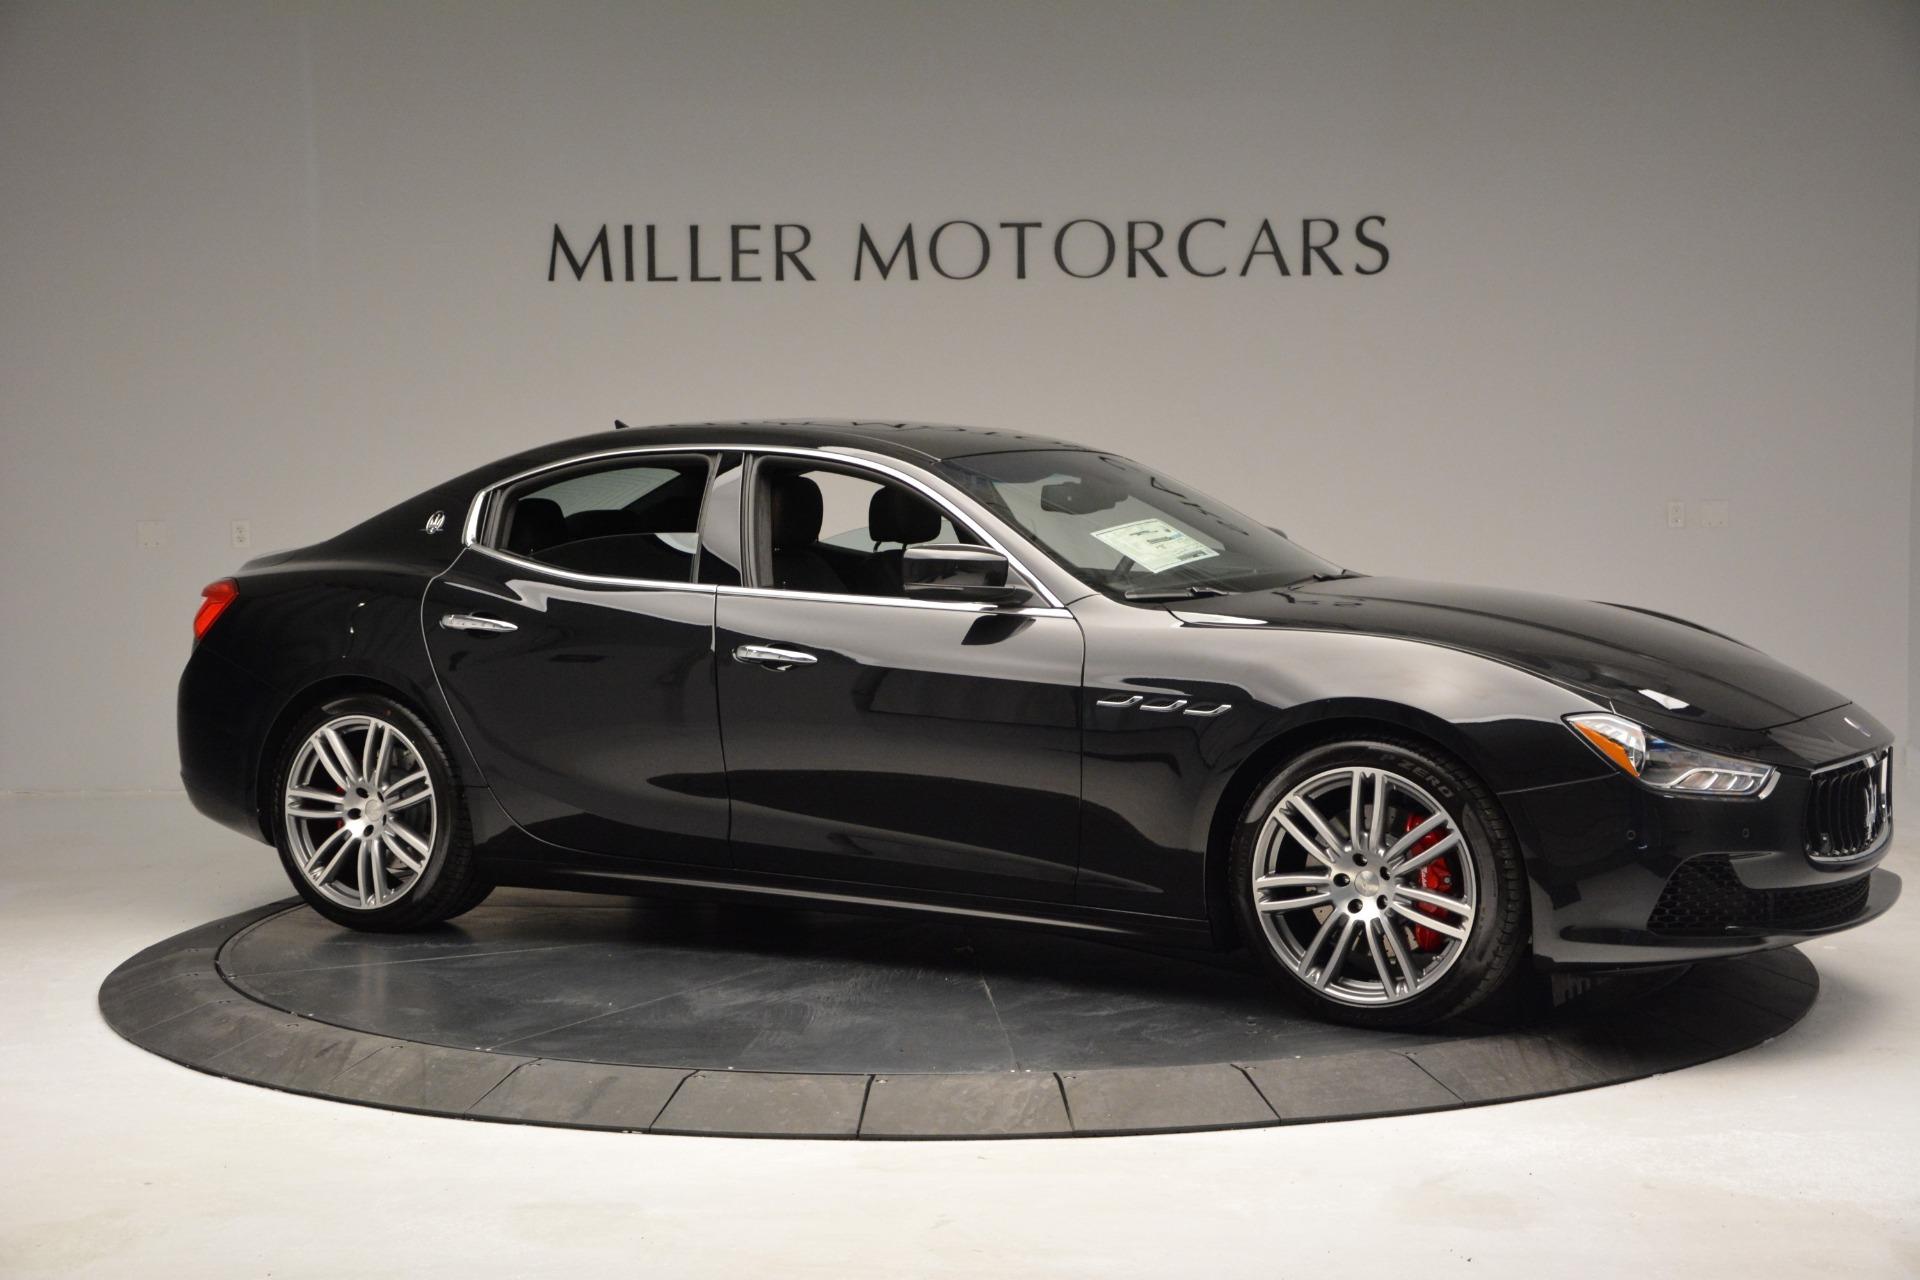 Used 2015 Maserati Ghibli S Q4 For Sale In Greenwich, CT. Alfa Romeo of Greenwich, 7325 2070_p10